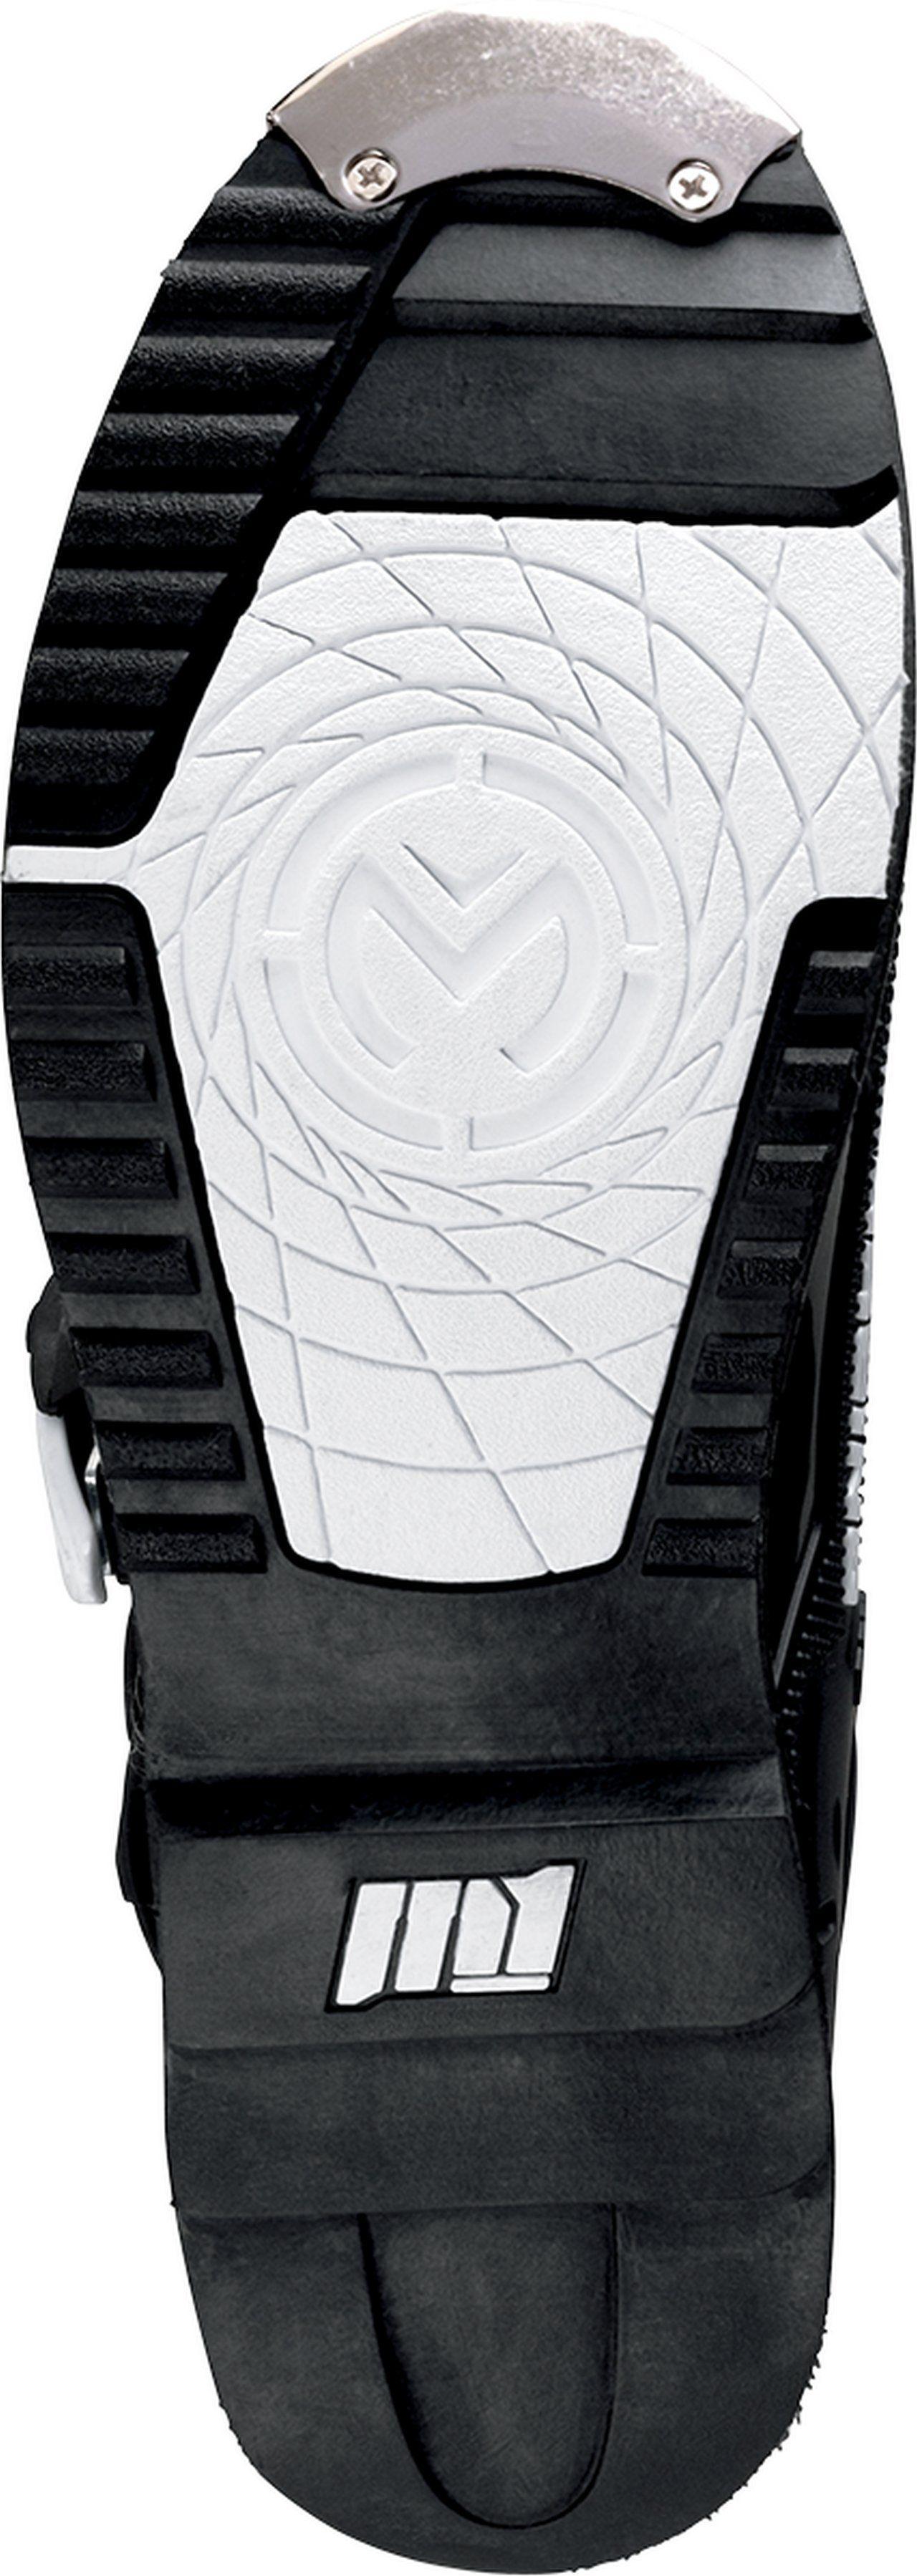 【MOOSE RACING】M1.2 越野車靴 [3410-0889] - 「Webike-摩托百貨」